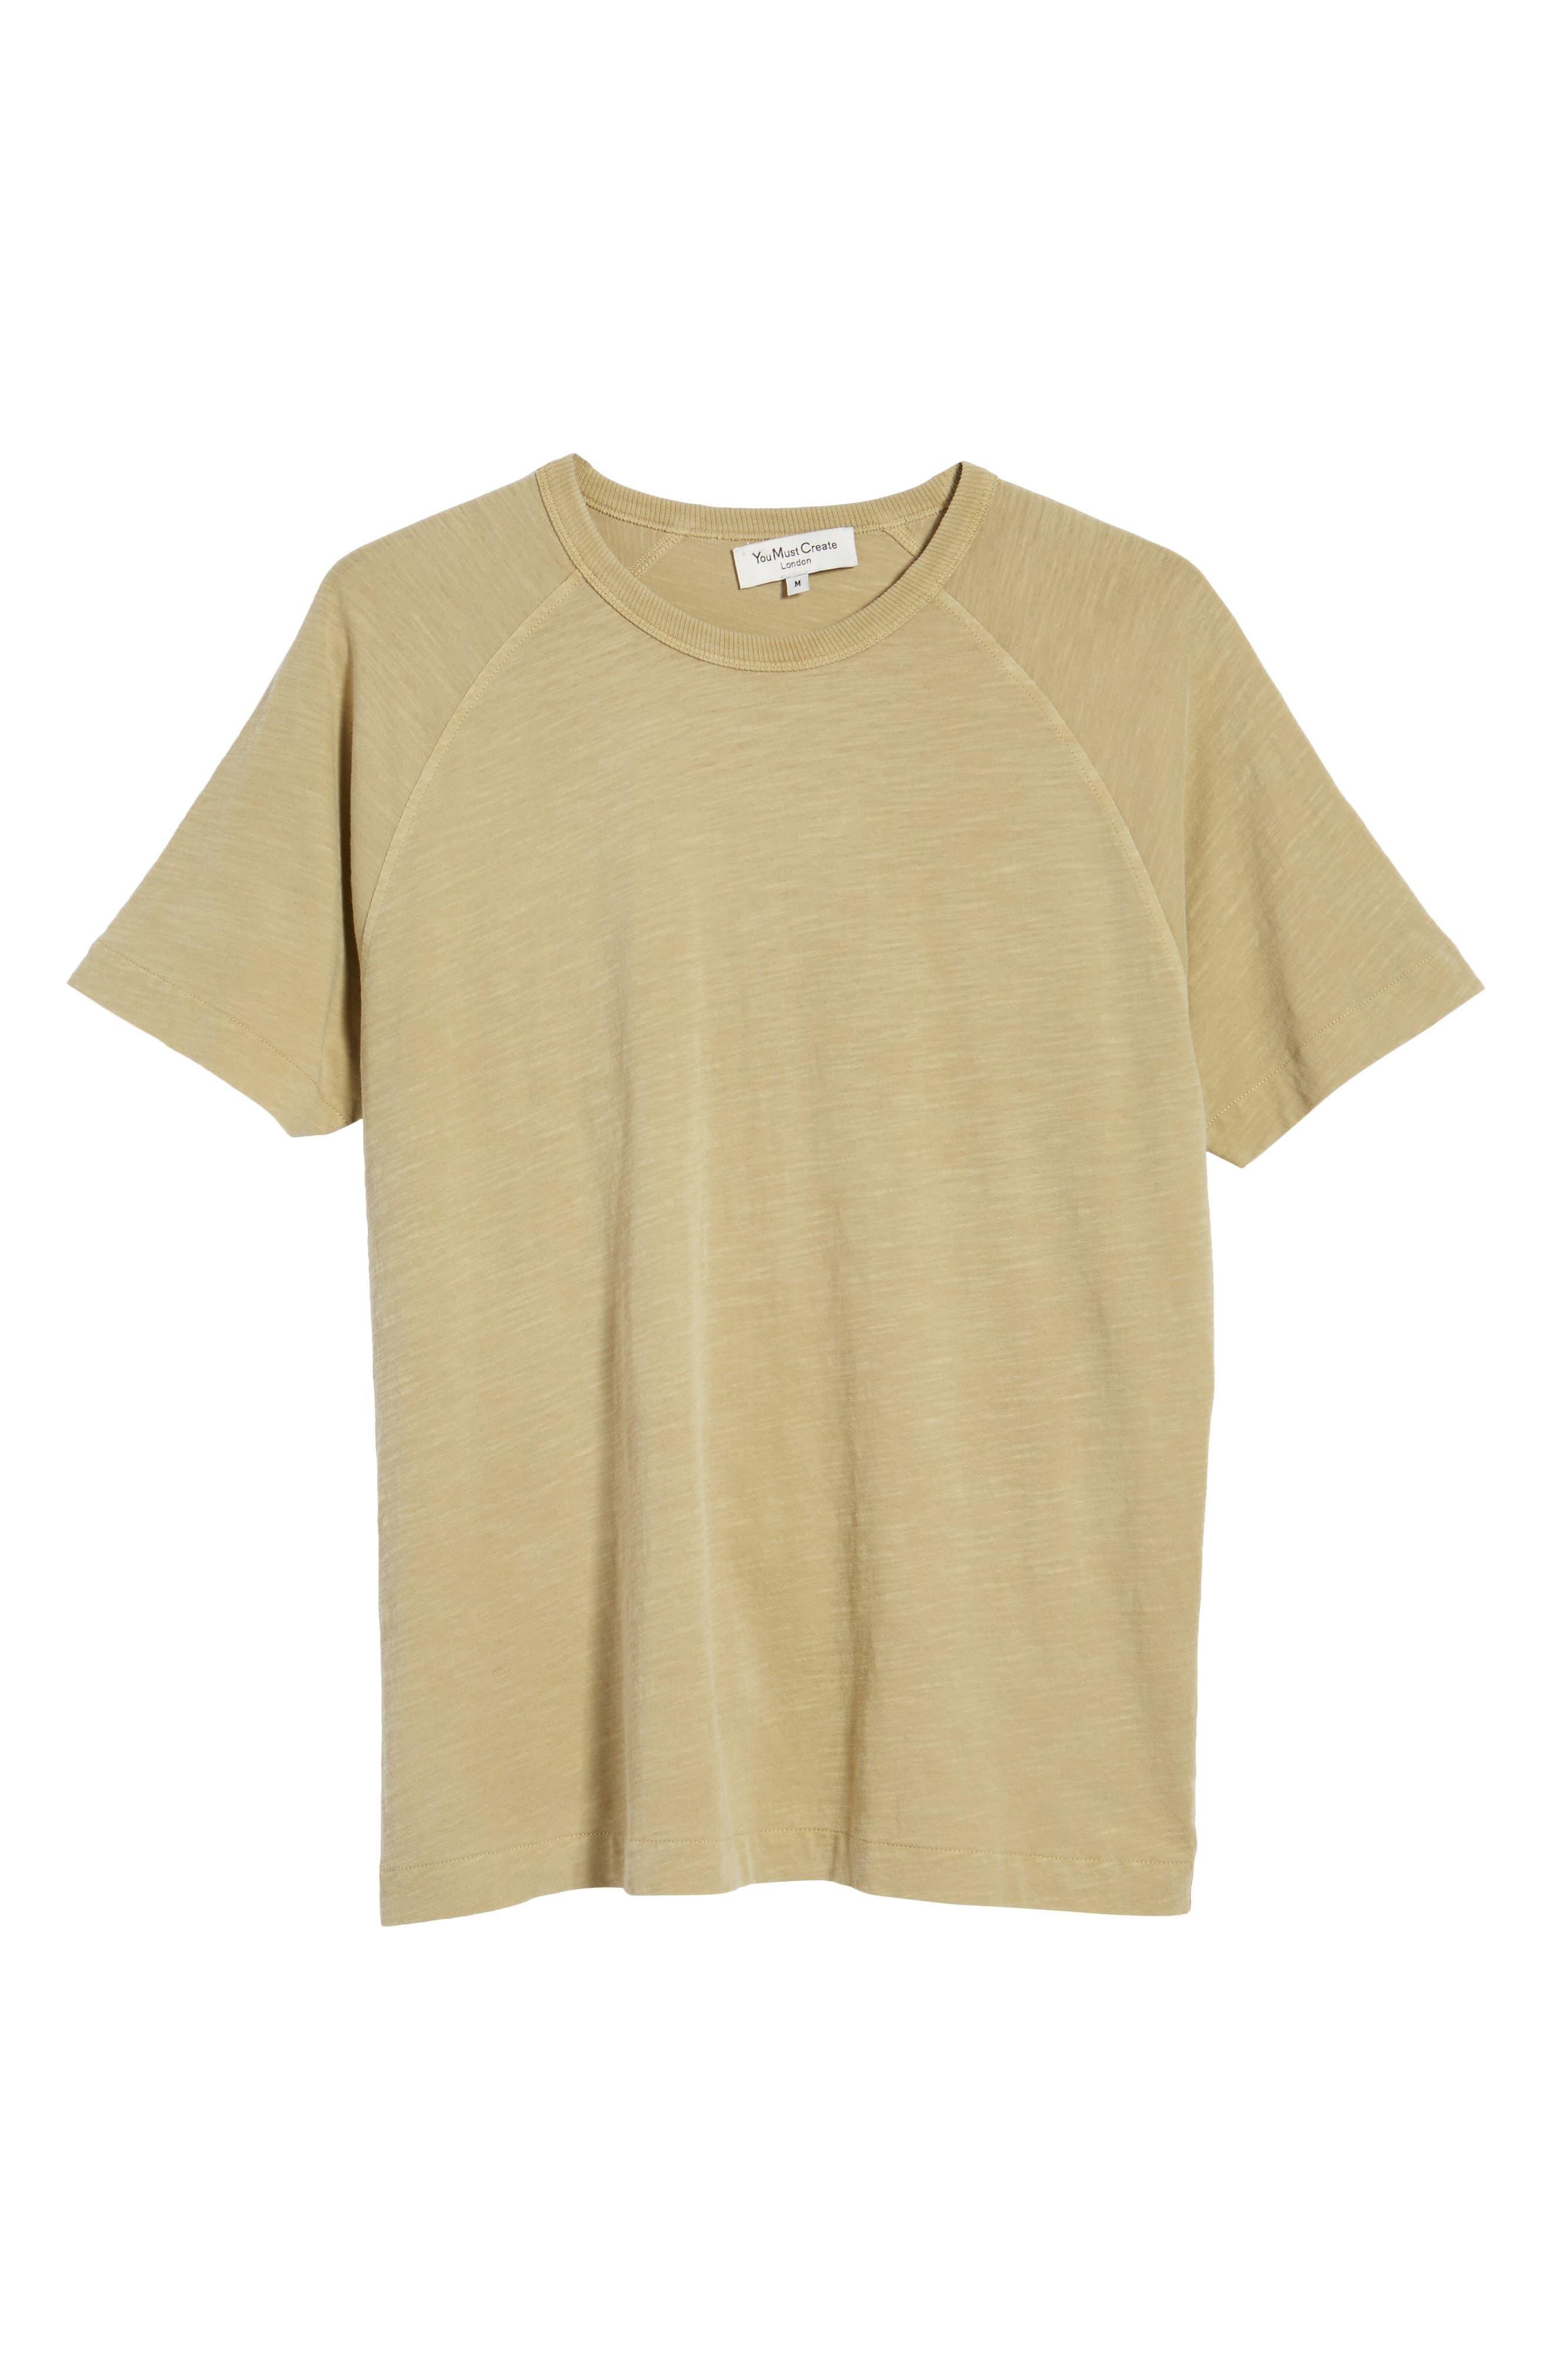 YMC,                             Television Raglan T-Shirt,                             Alternate thumbnail 6, color,                             250